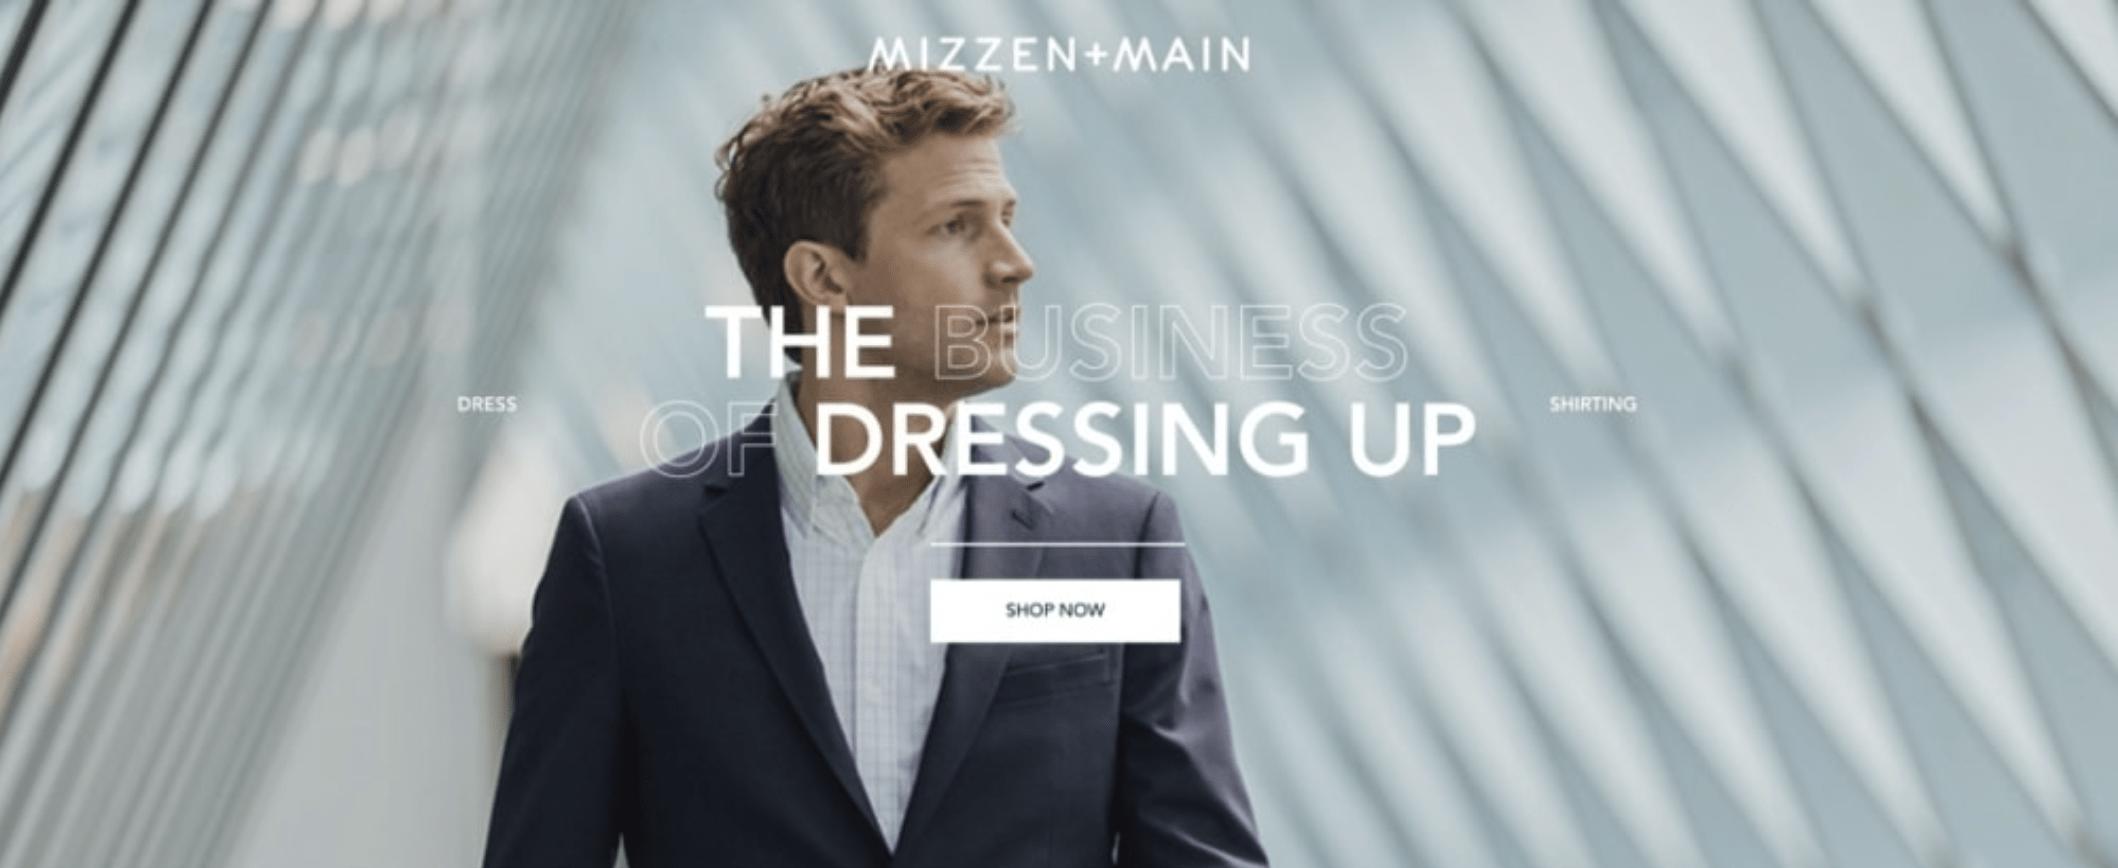 Landing Page Headlines - Mizzen + Main